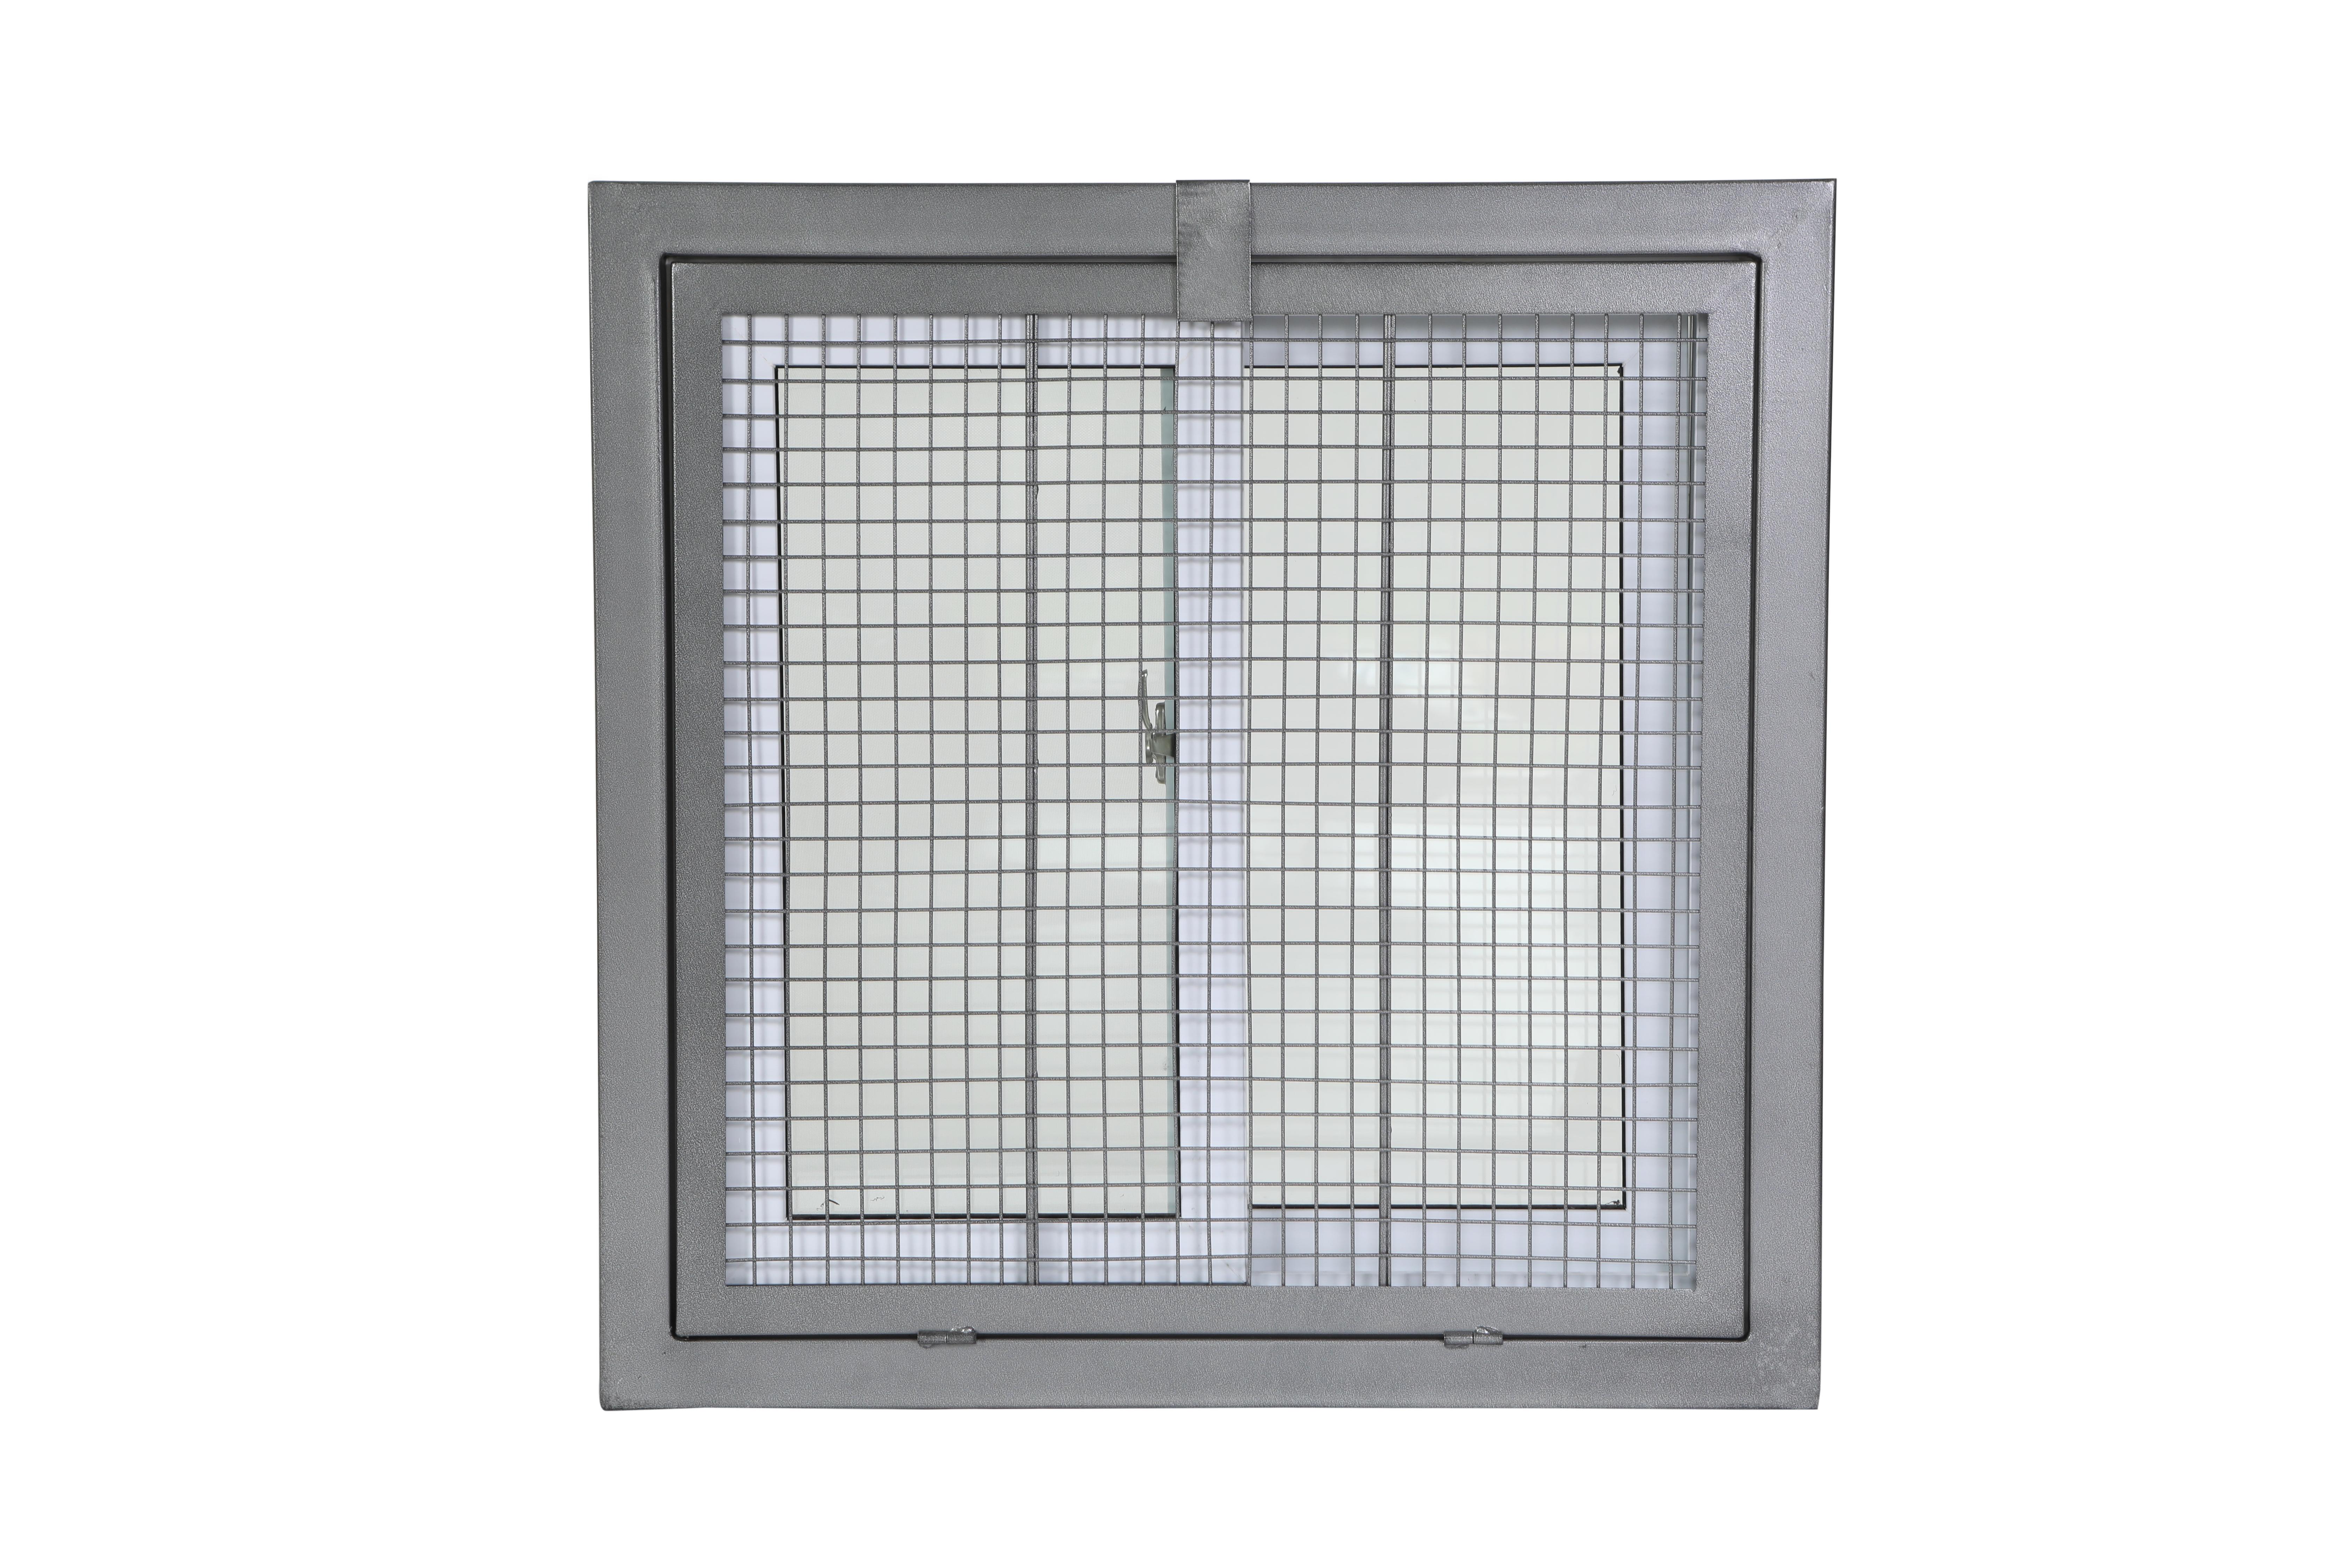 F1g.6066 - 3'x3' INSTA Frame and Window PVC1